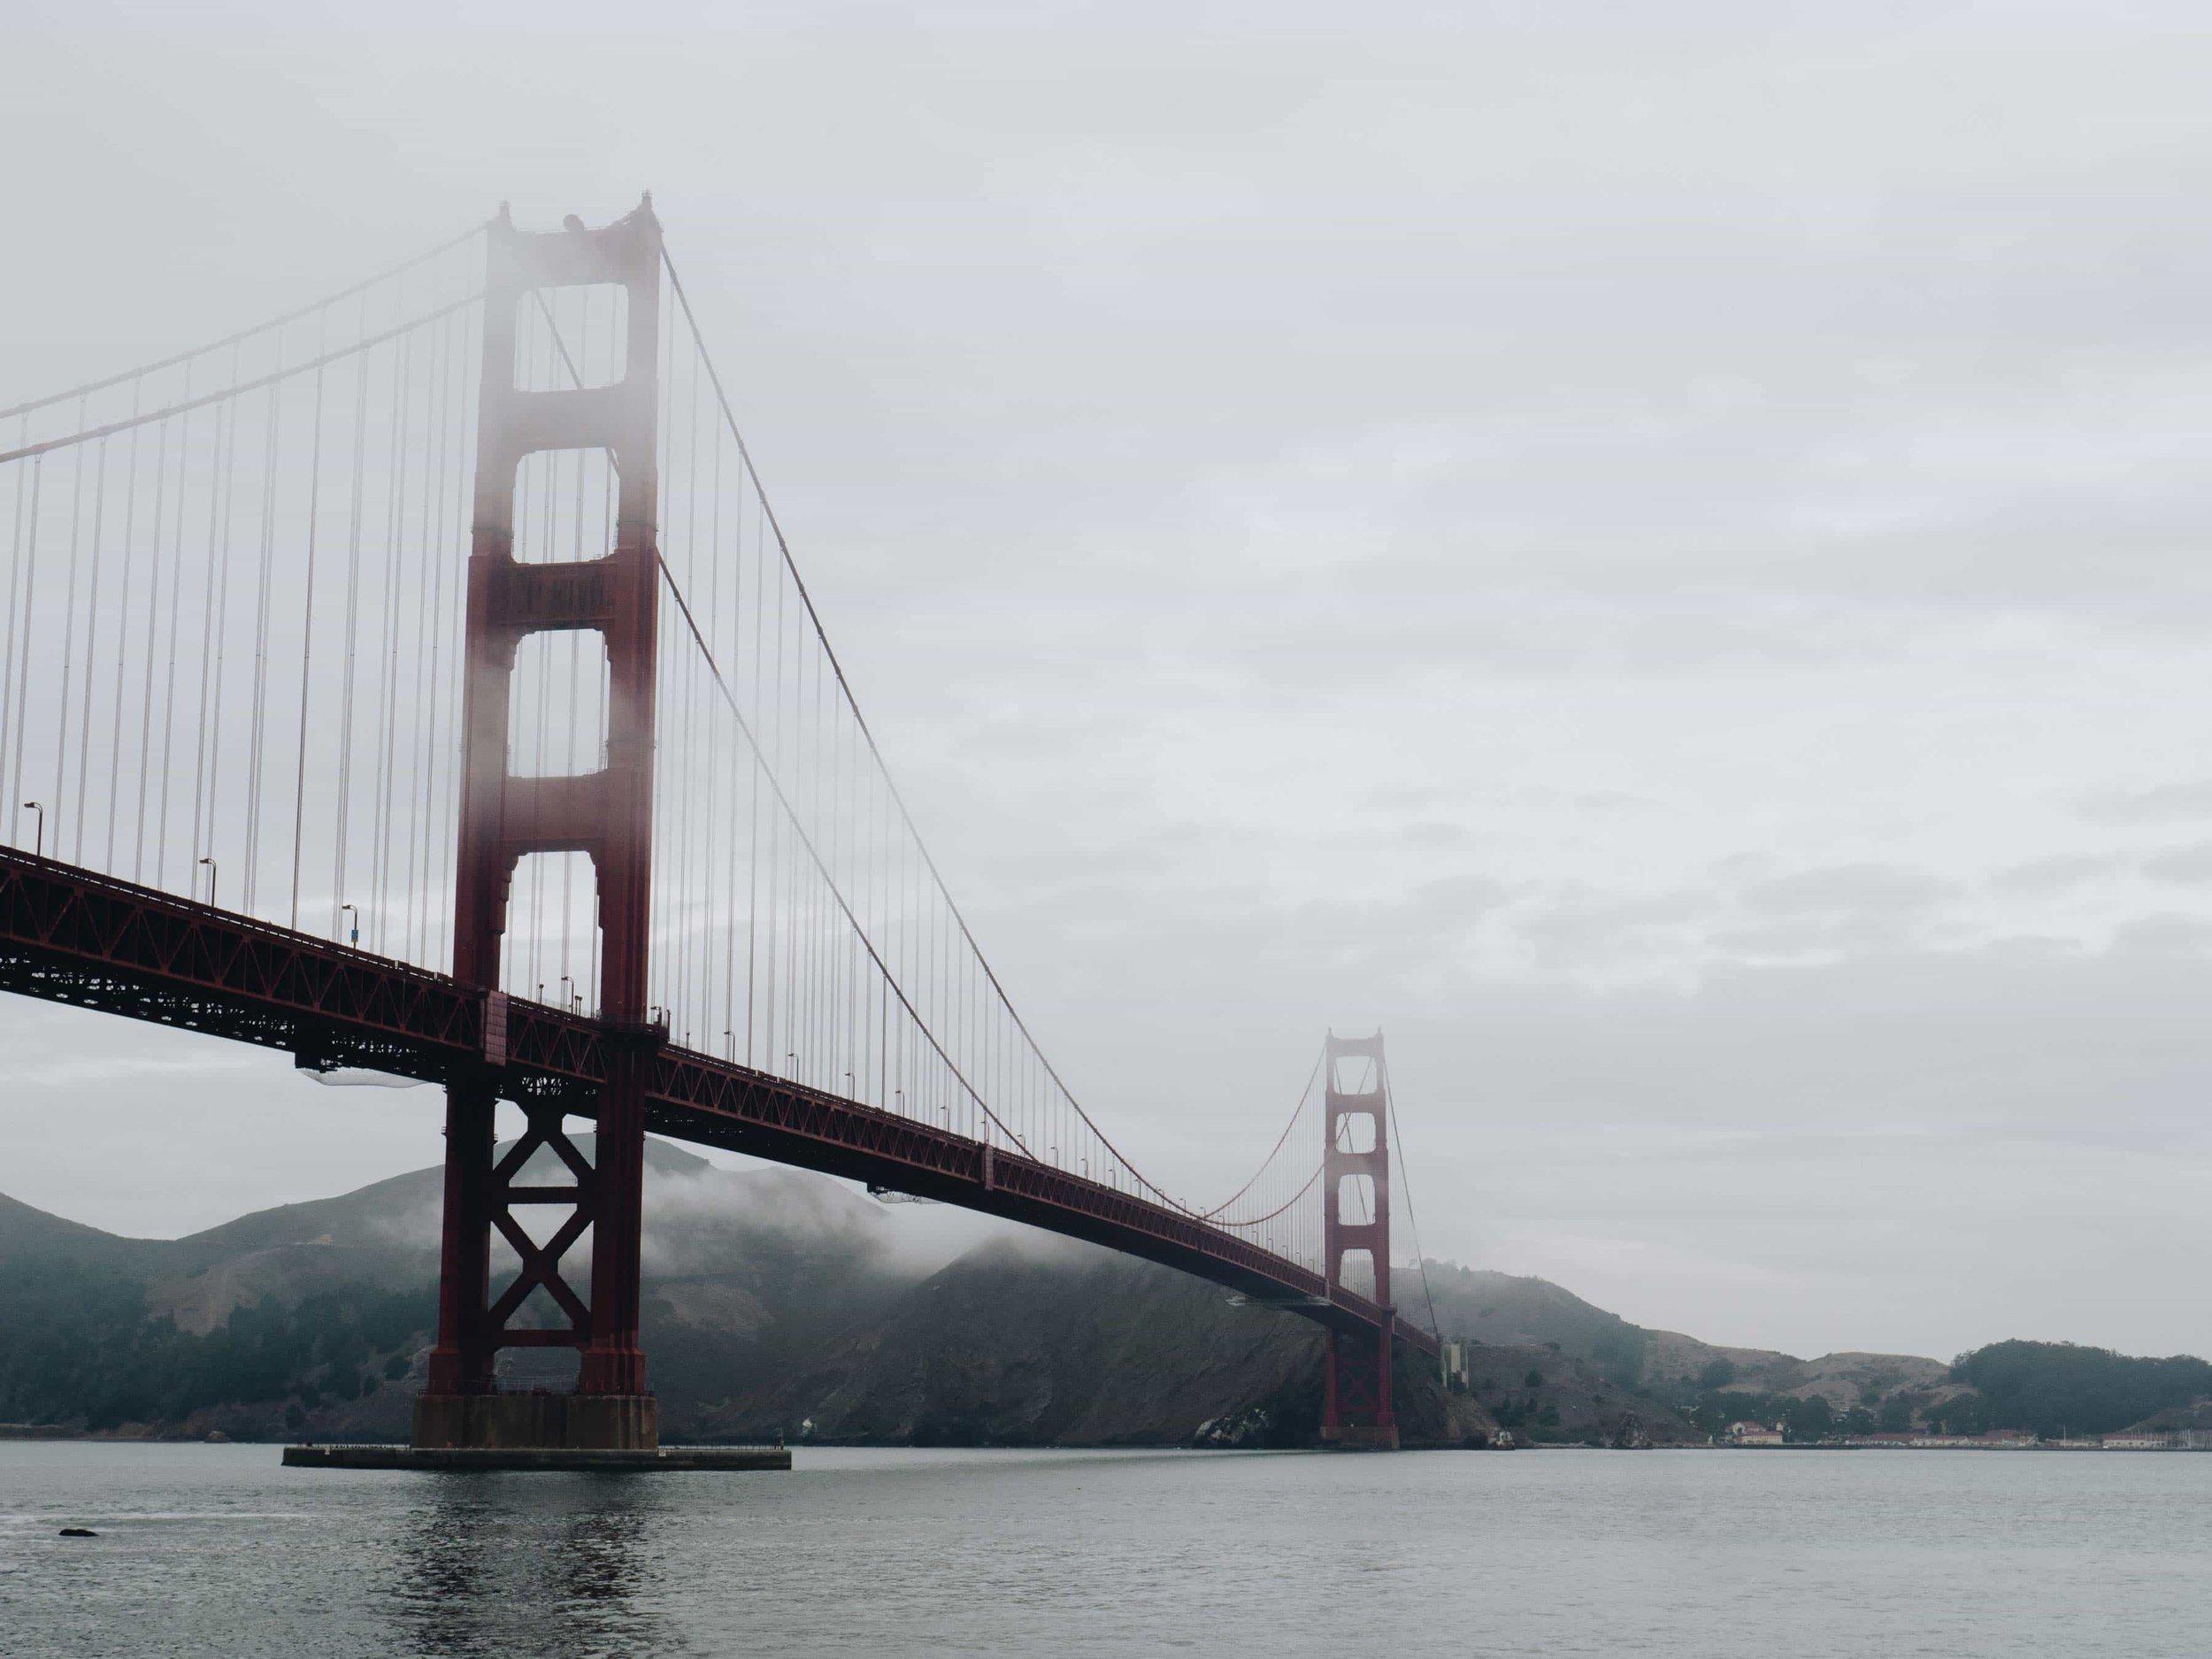 October '18 San Fransisco, CA